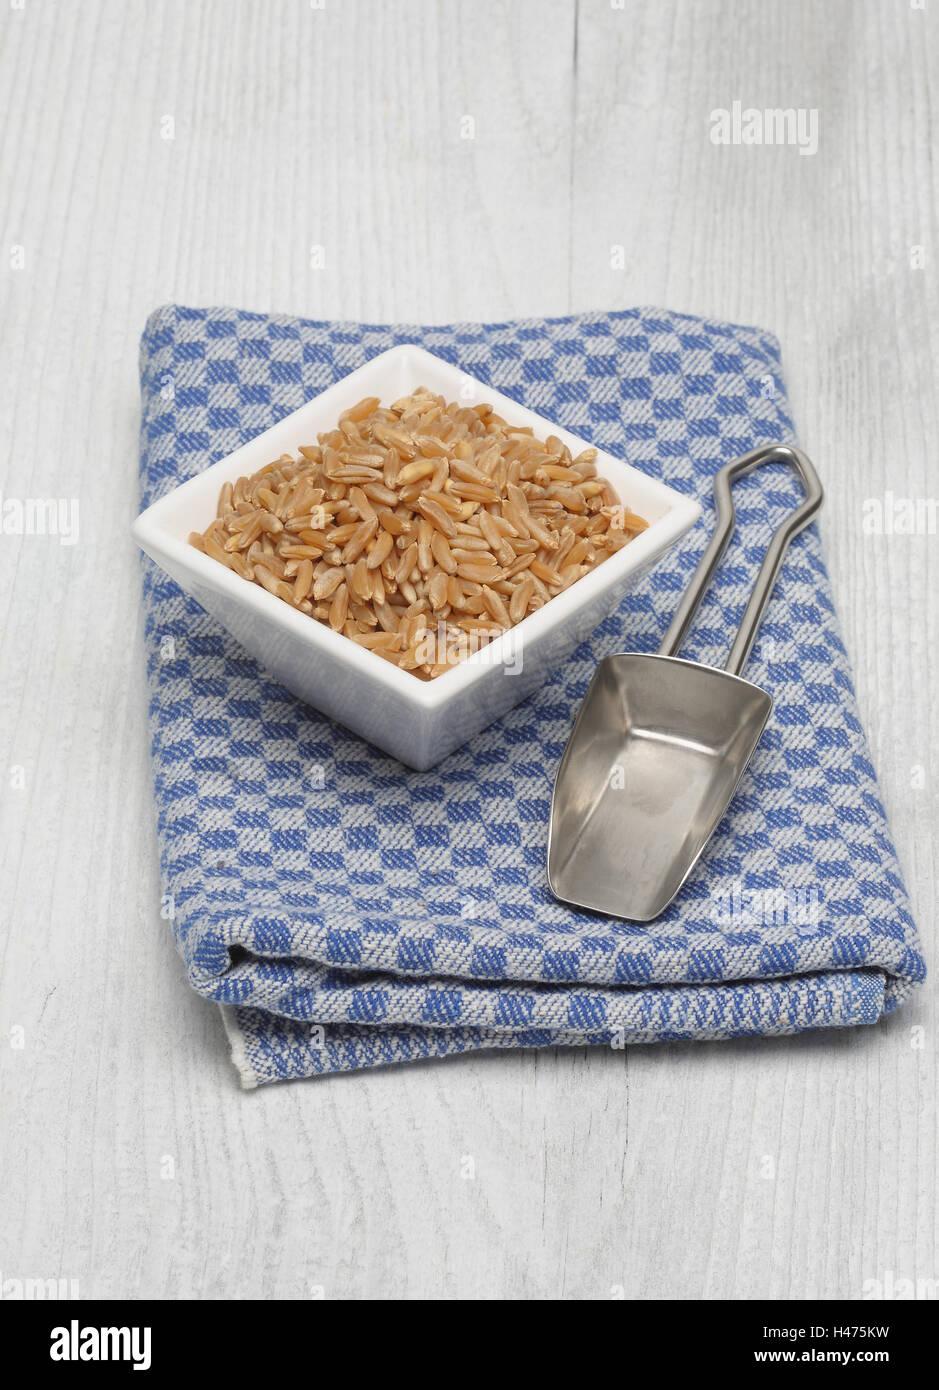 Ur cereal Kamut, Khorasan wheat, Triticum turgidum x polonicum Stock Photo